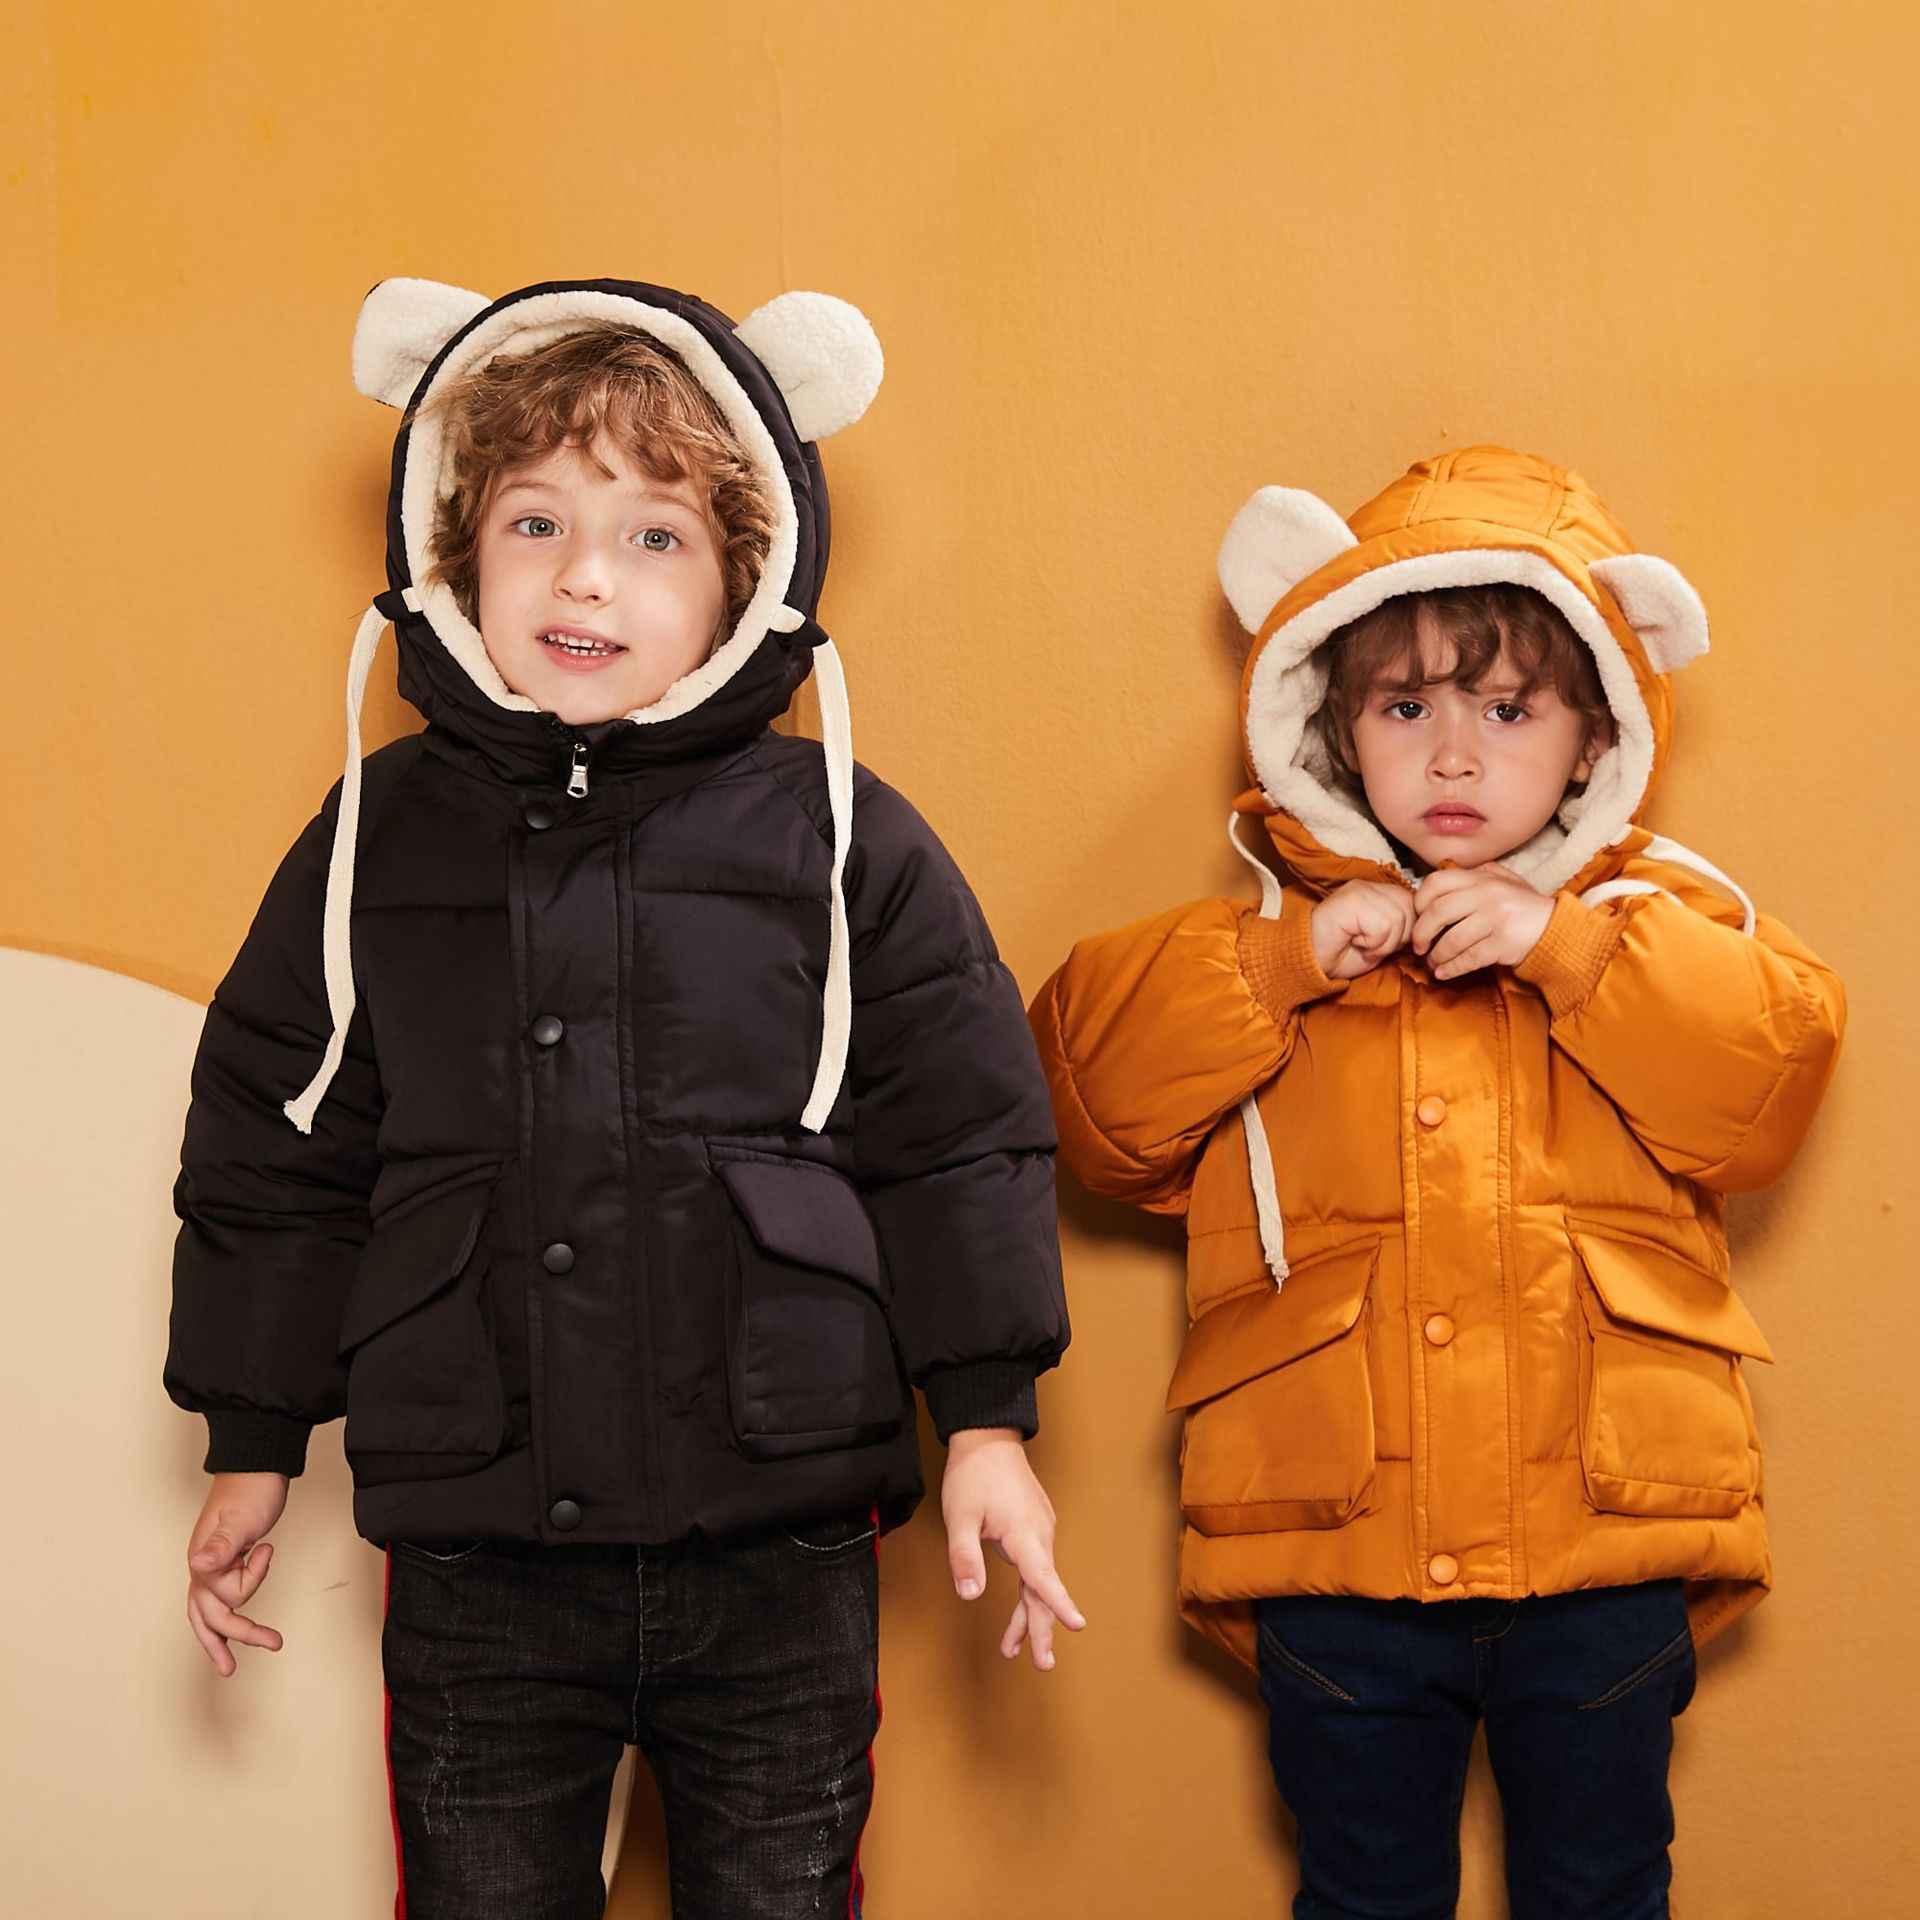 CYSINCOS 2019 חורף חם מעילי תינוק בנות בגדי ילדי מעילי כותנה ברדס להאריך ימים יותר מעיל בני בנות בגדים